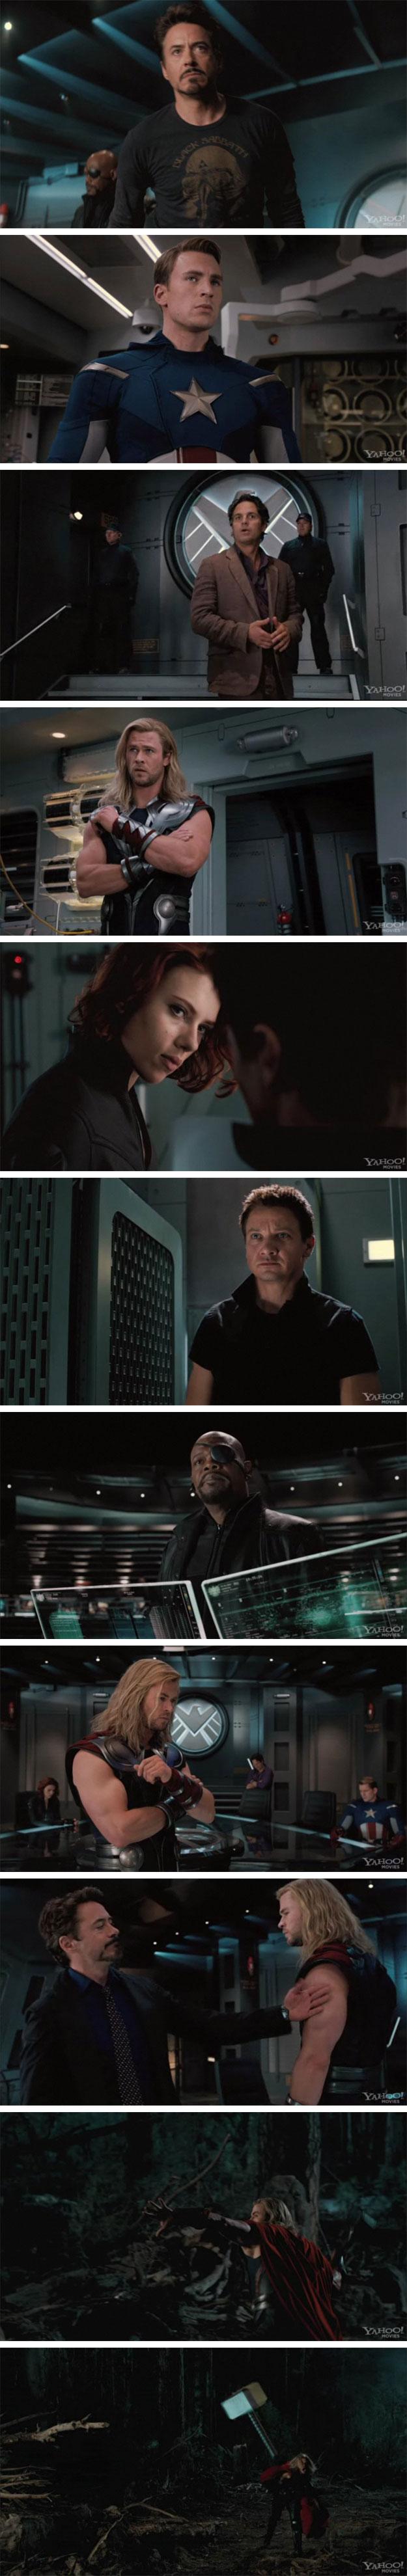 The Avengers - Joss Whedon - Page 3 Temp2867